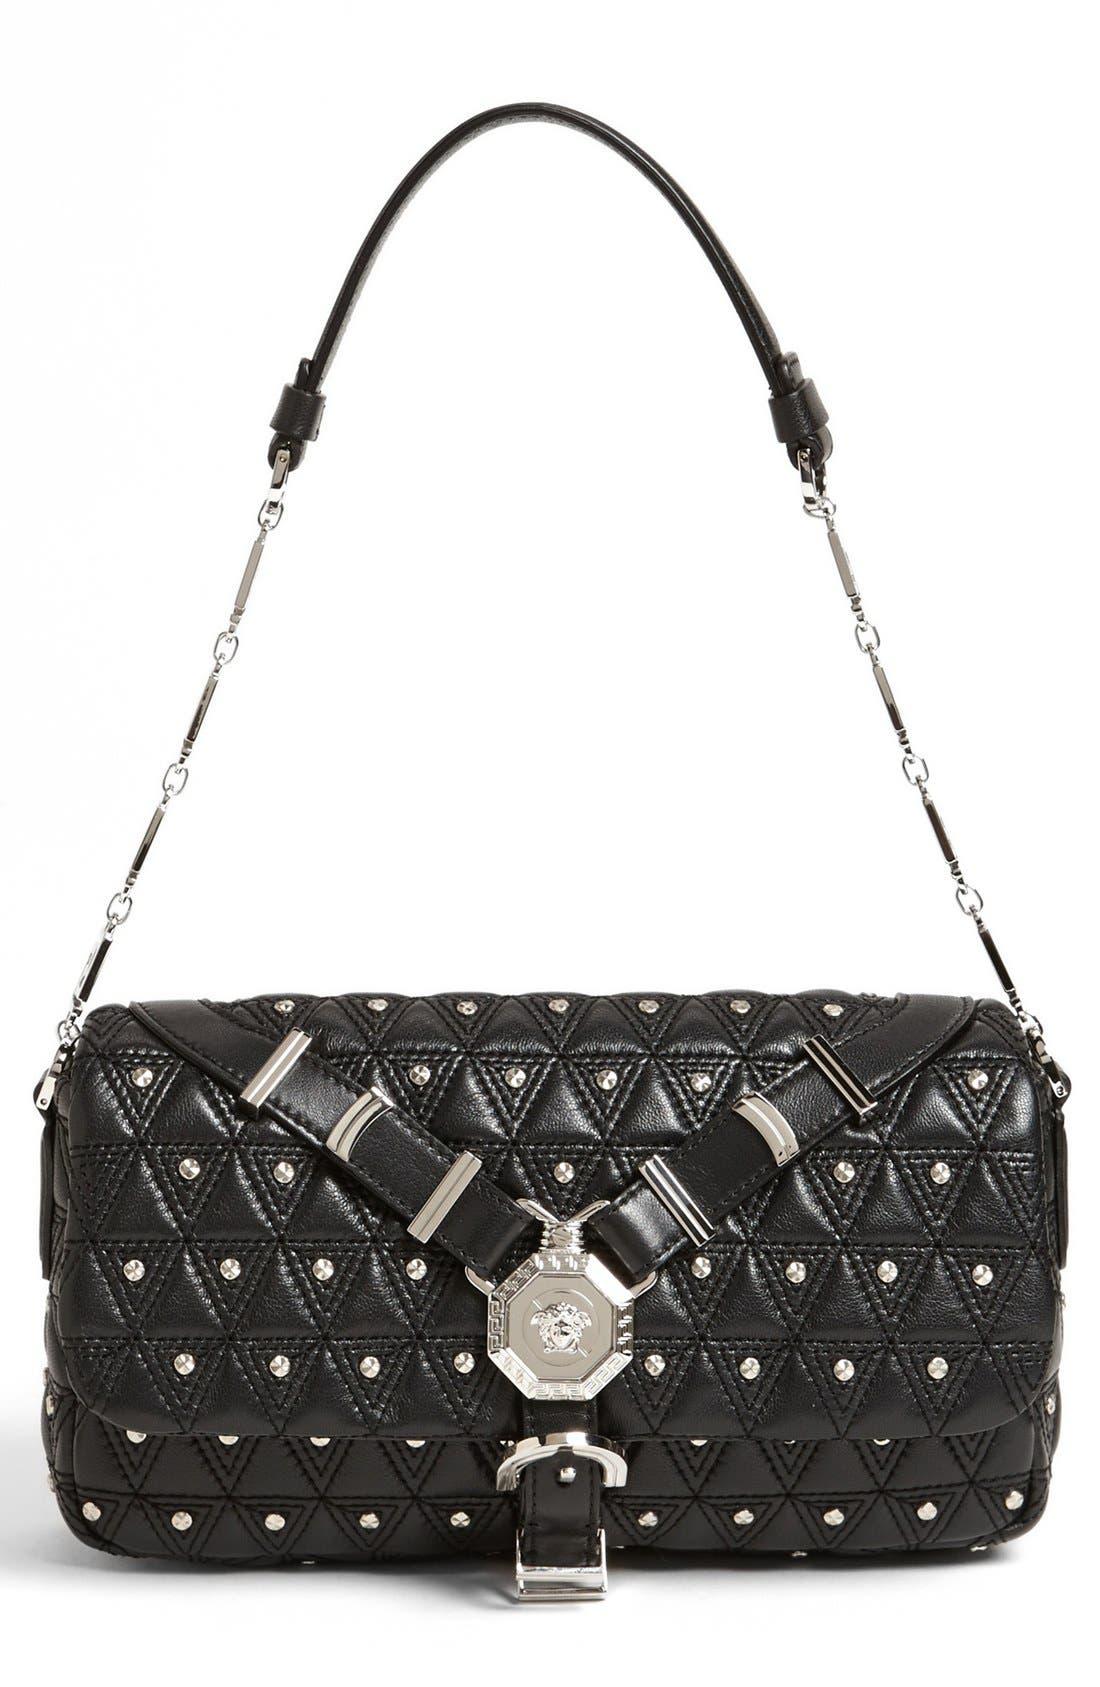 Alternate Image 1 Selected - Versace 'Vanitas' Leather Flap Shoulder Bag